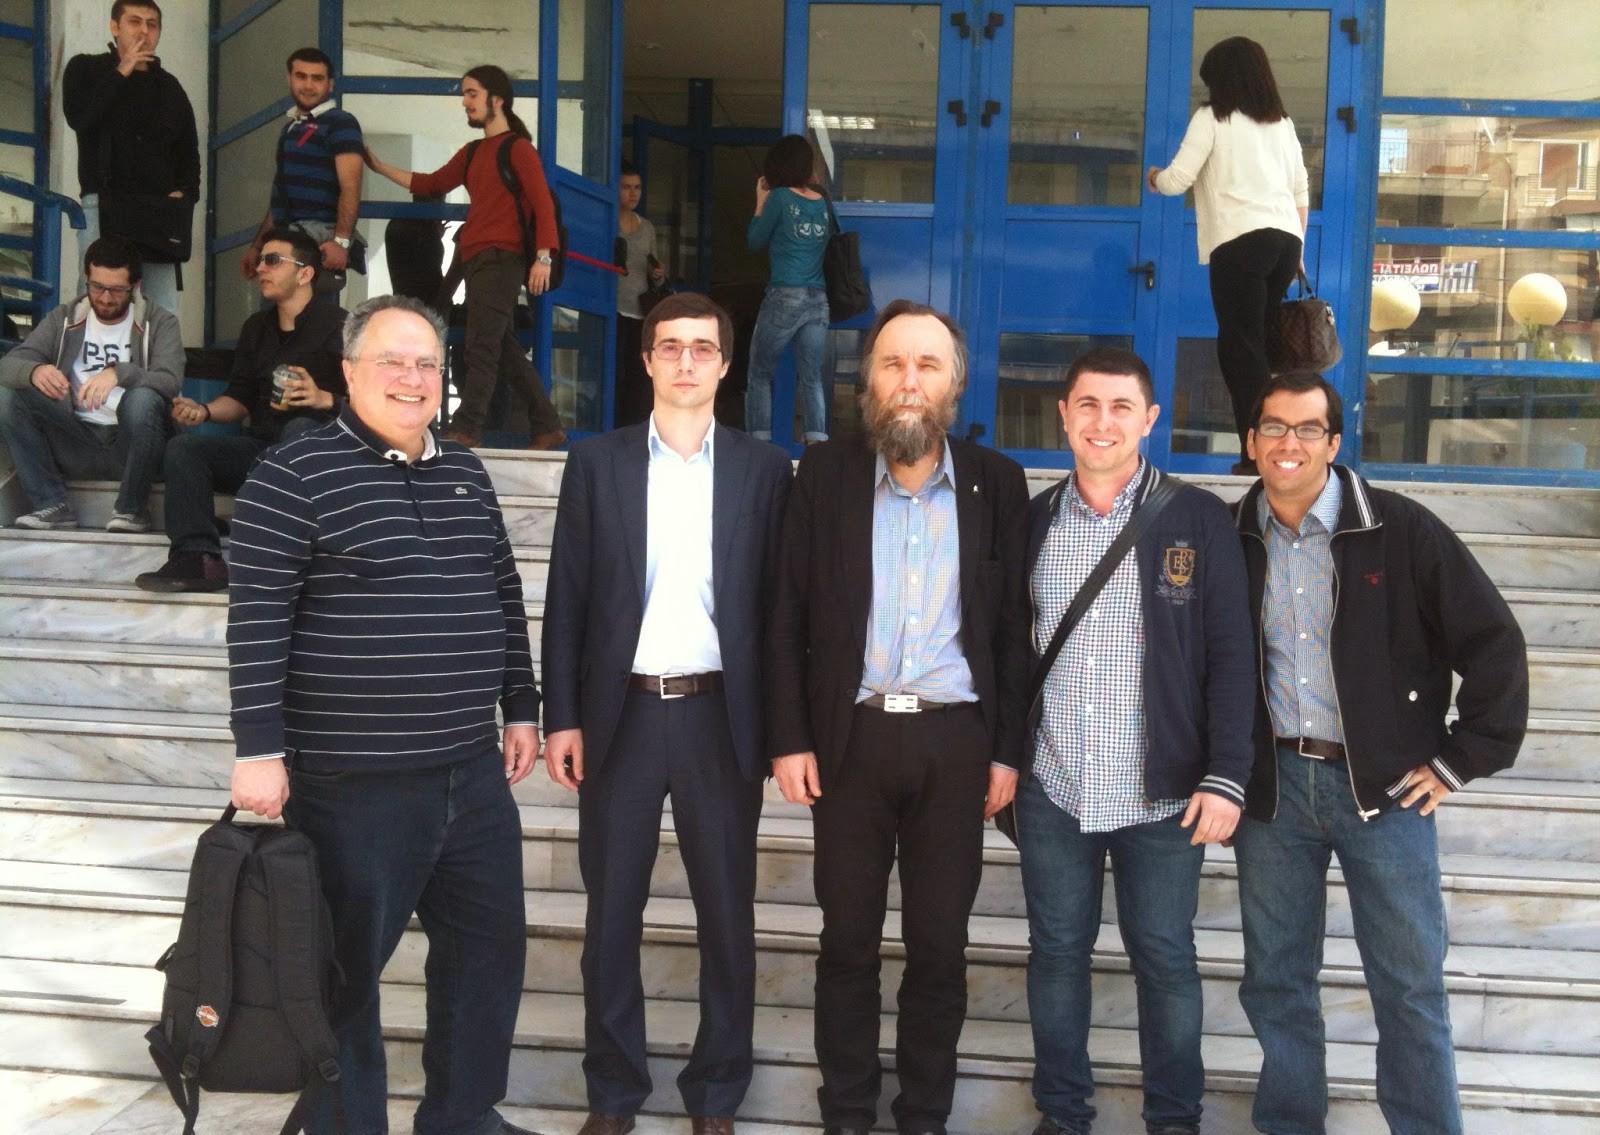 Greek Foreign Minister Nikos Kotzias (far left) and A. Dugin (center). From The Interpreter, January 28, 2015